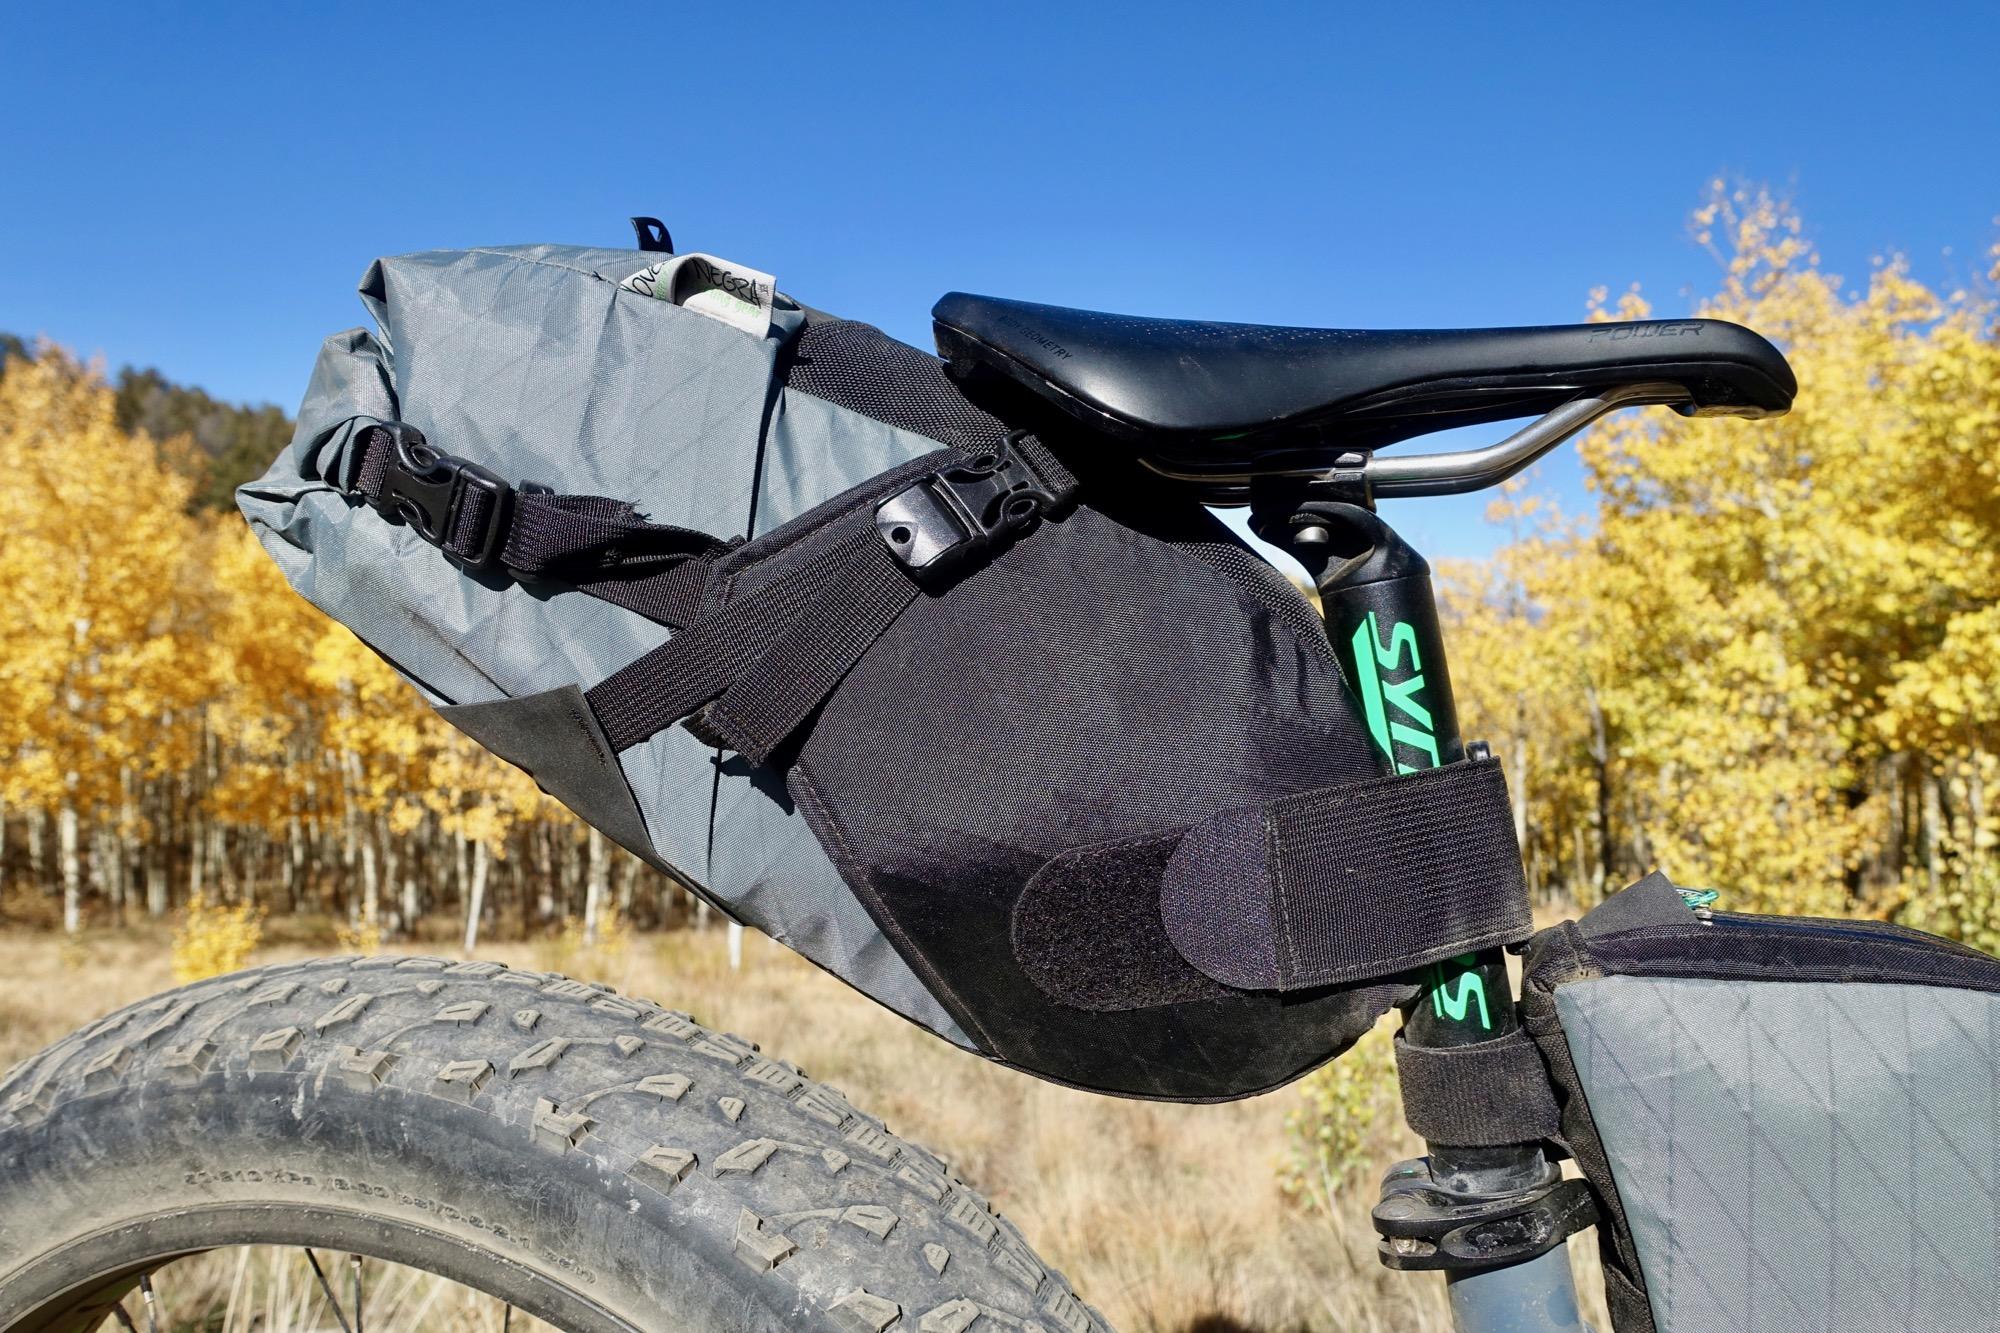 Oveja Negra Gearjammer Seat Bag Review Singletracks Mountain Bike News